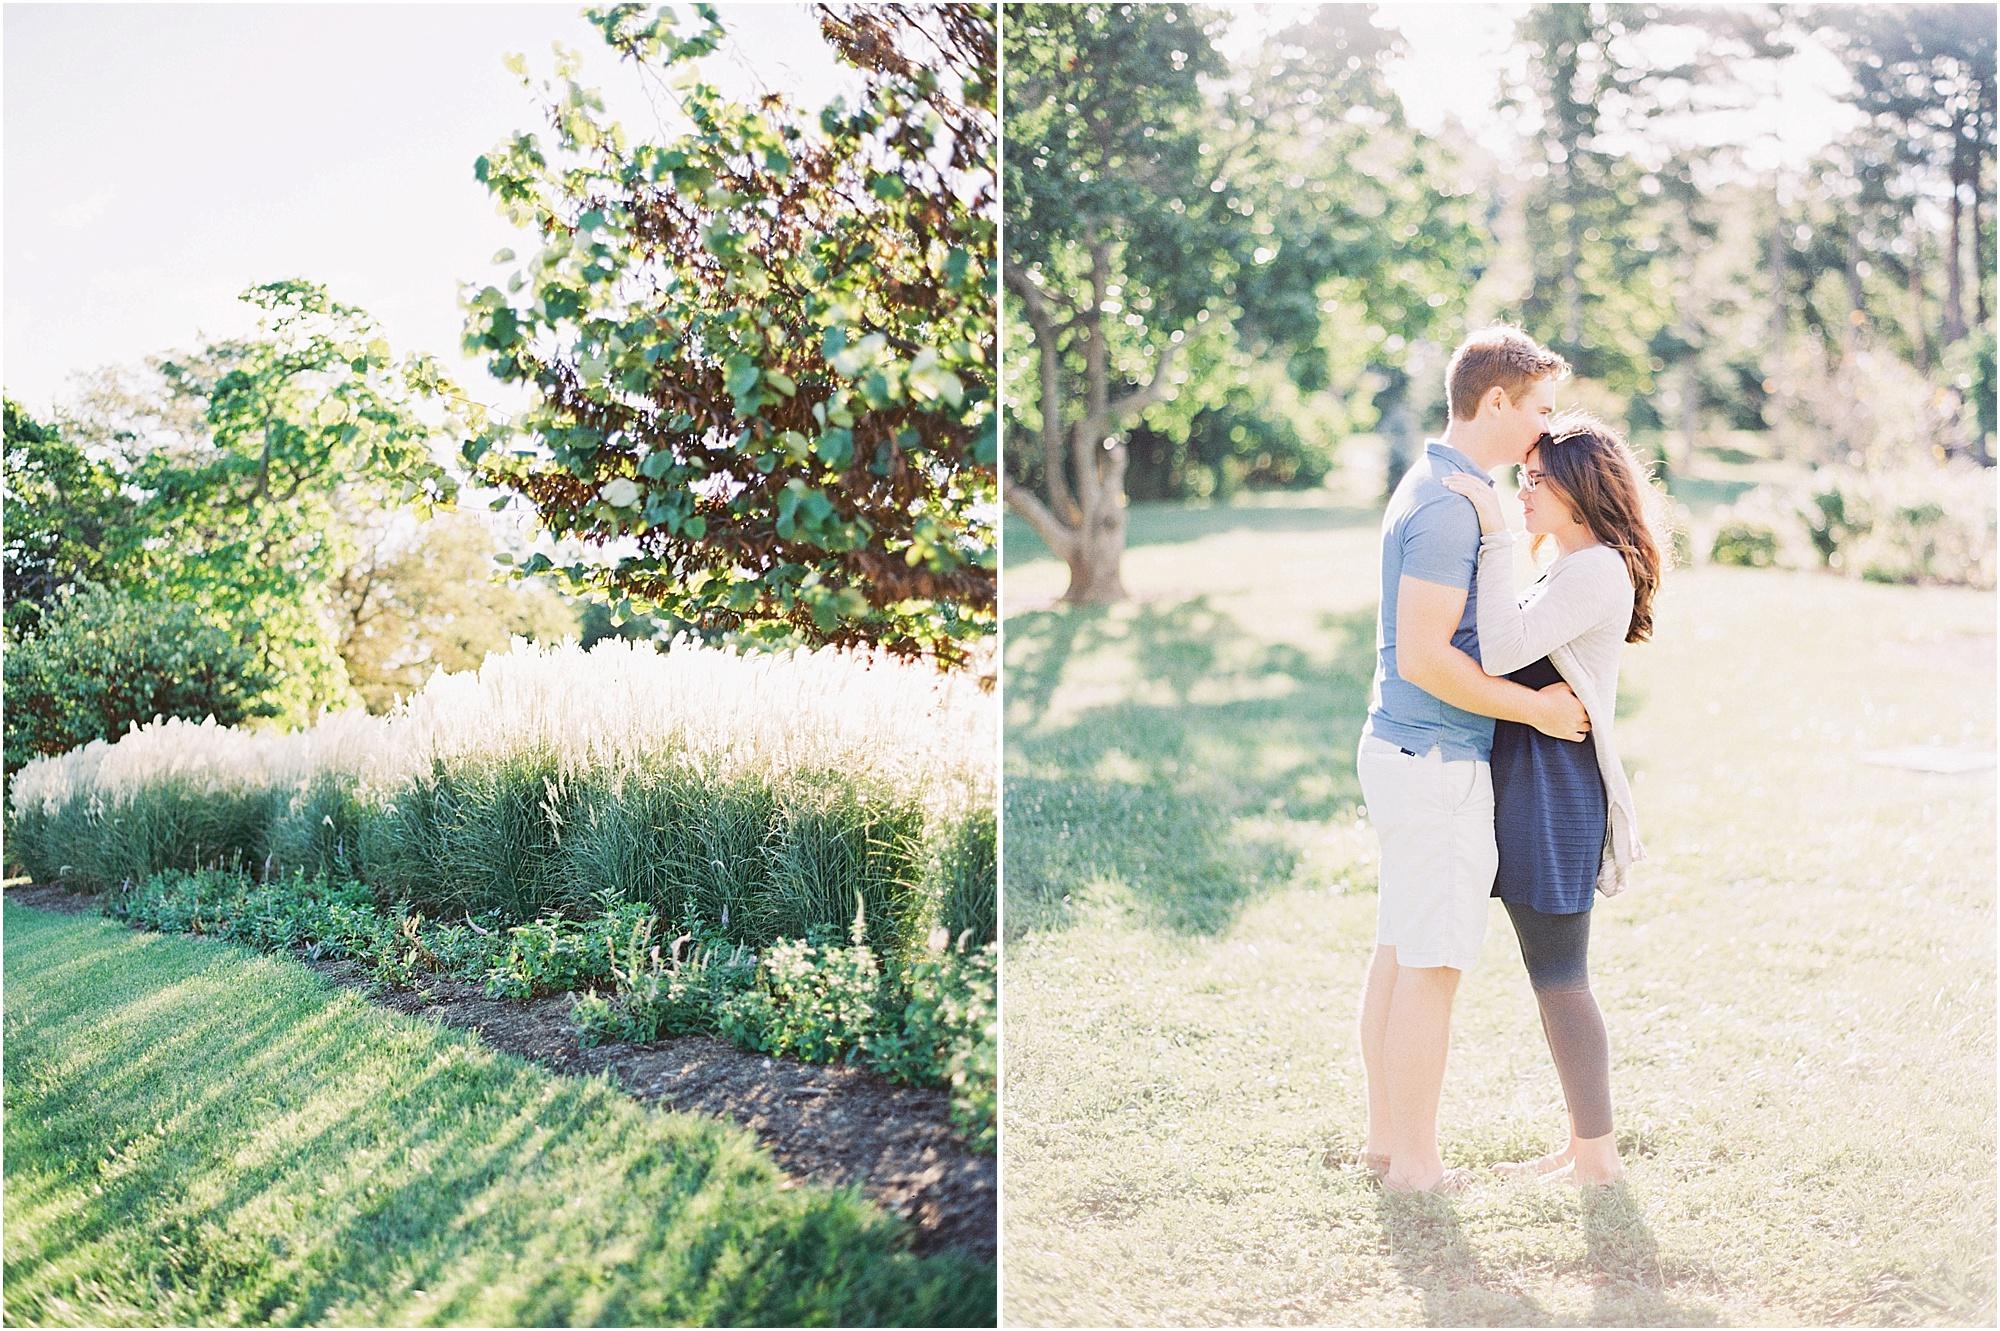 St Louis Missouri Forrest Park Proposal - Jordan Brittley Photography (www.jordanbrittley.com)